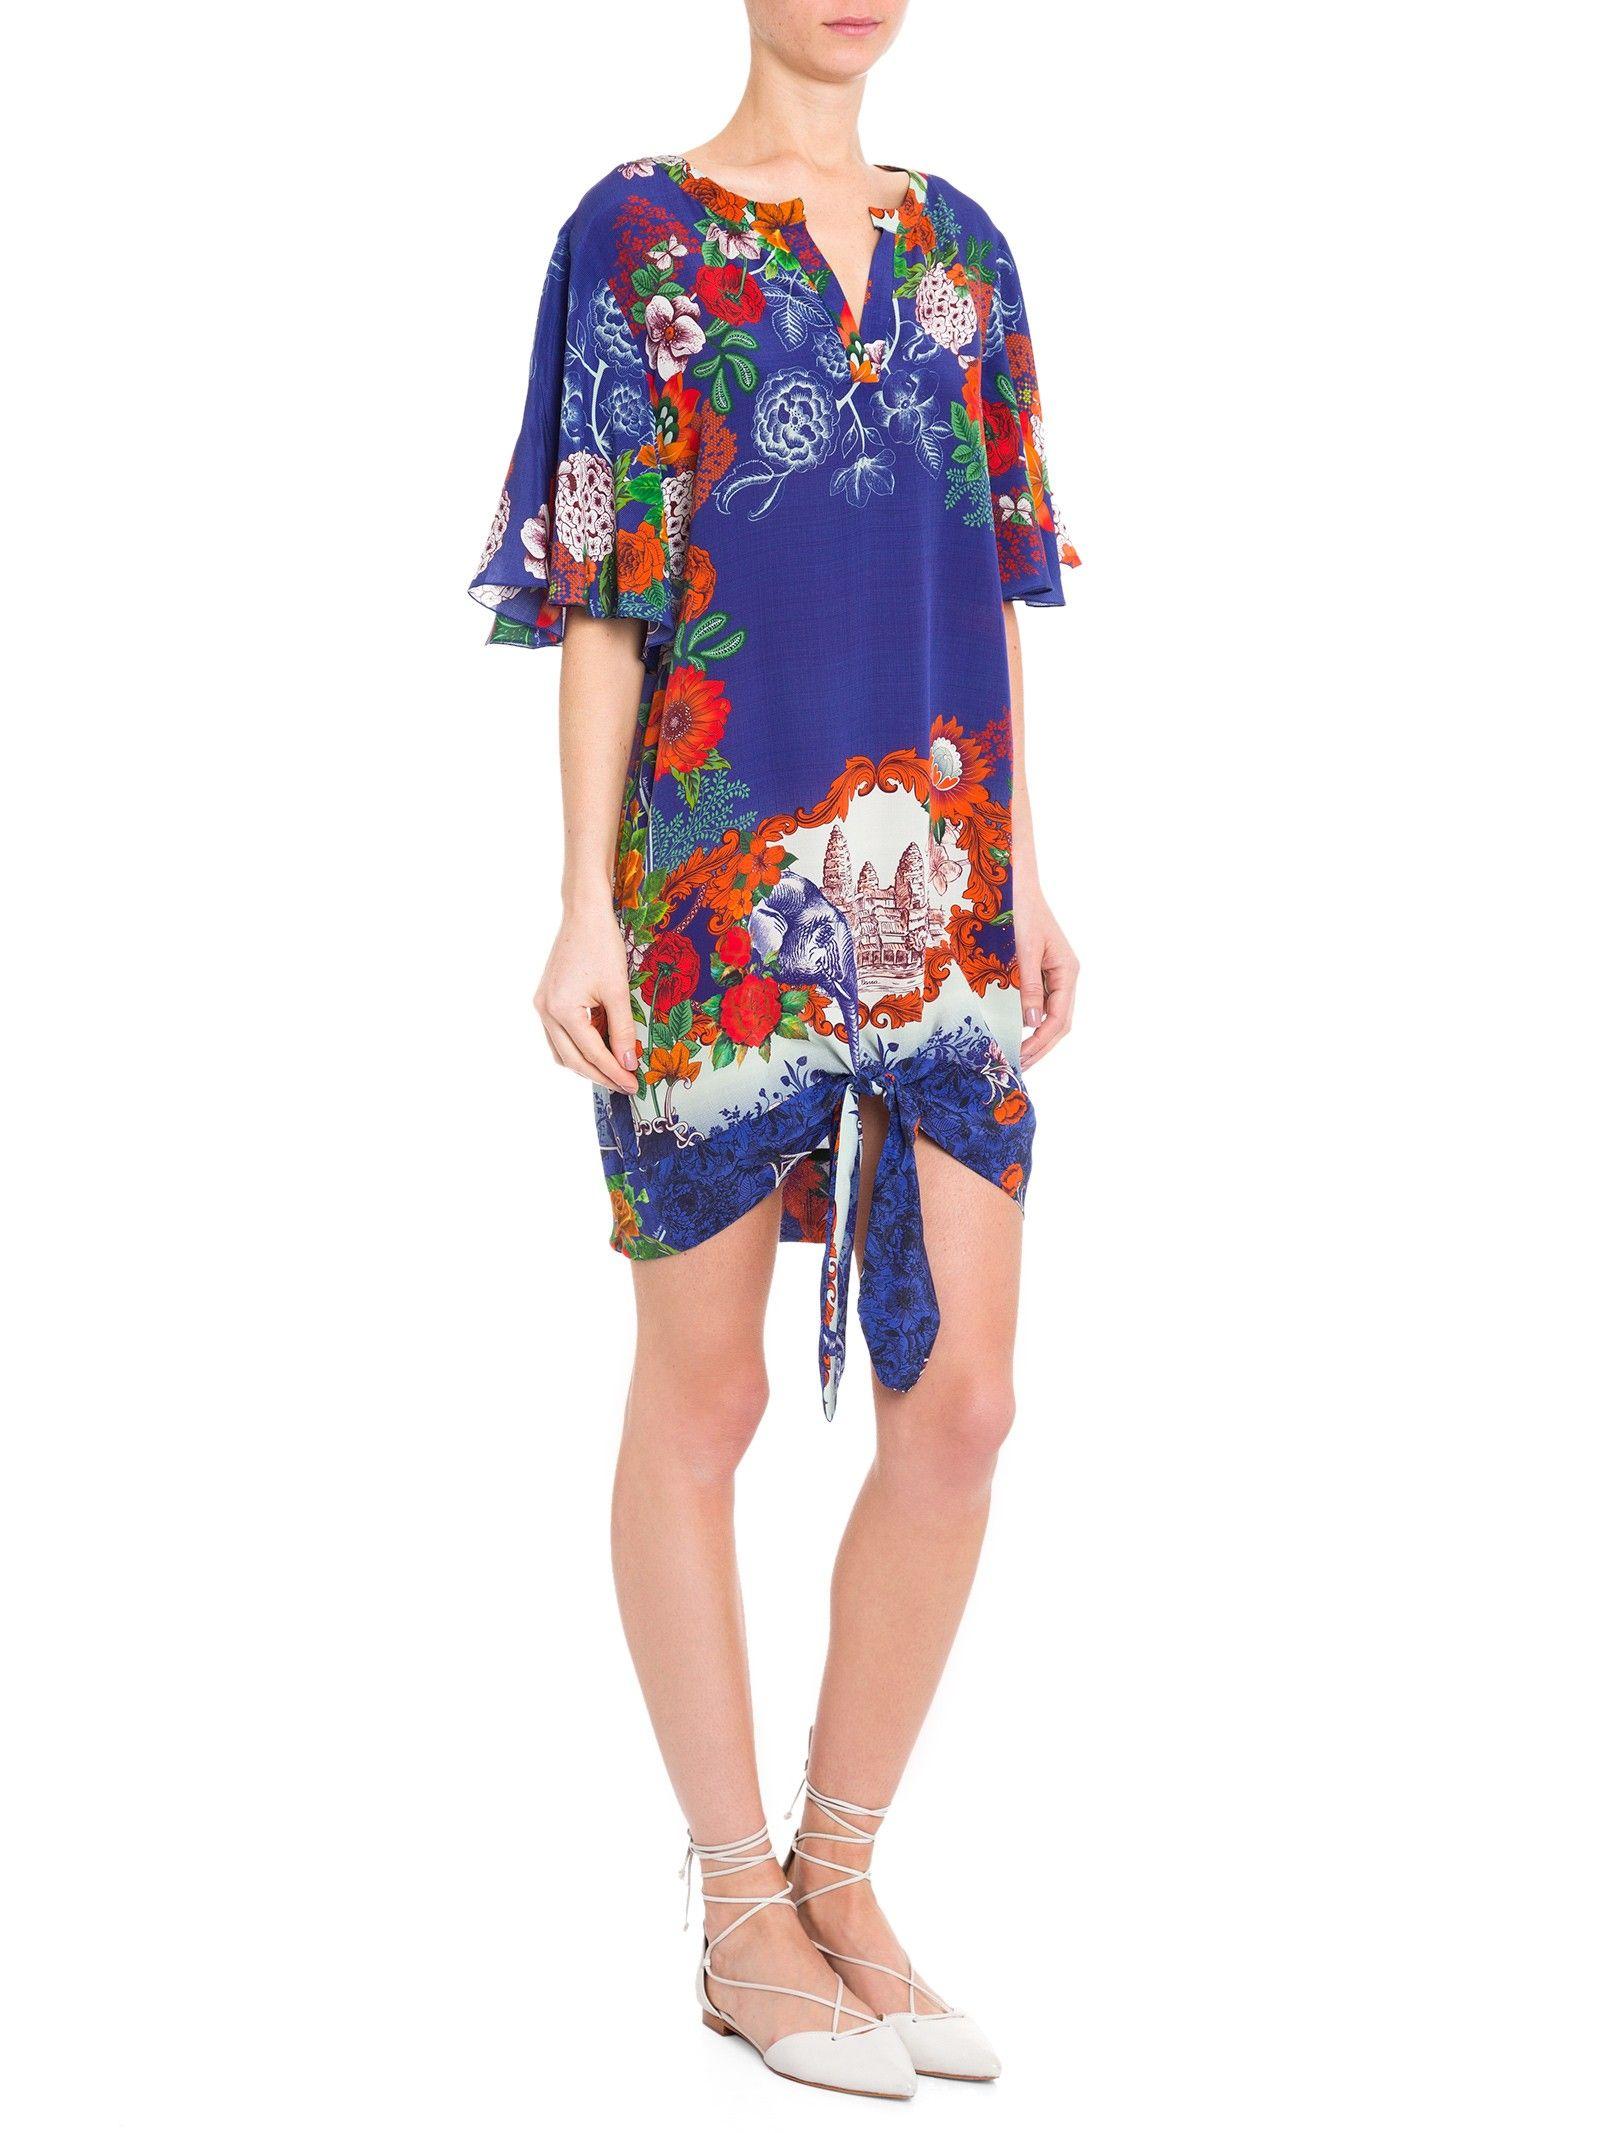 Vestido Papier Peint Exotic - Adriana Barra - Azul  - Shop2gether